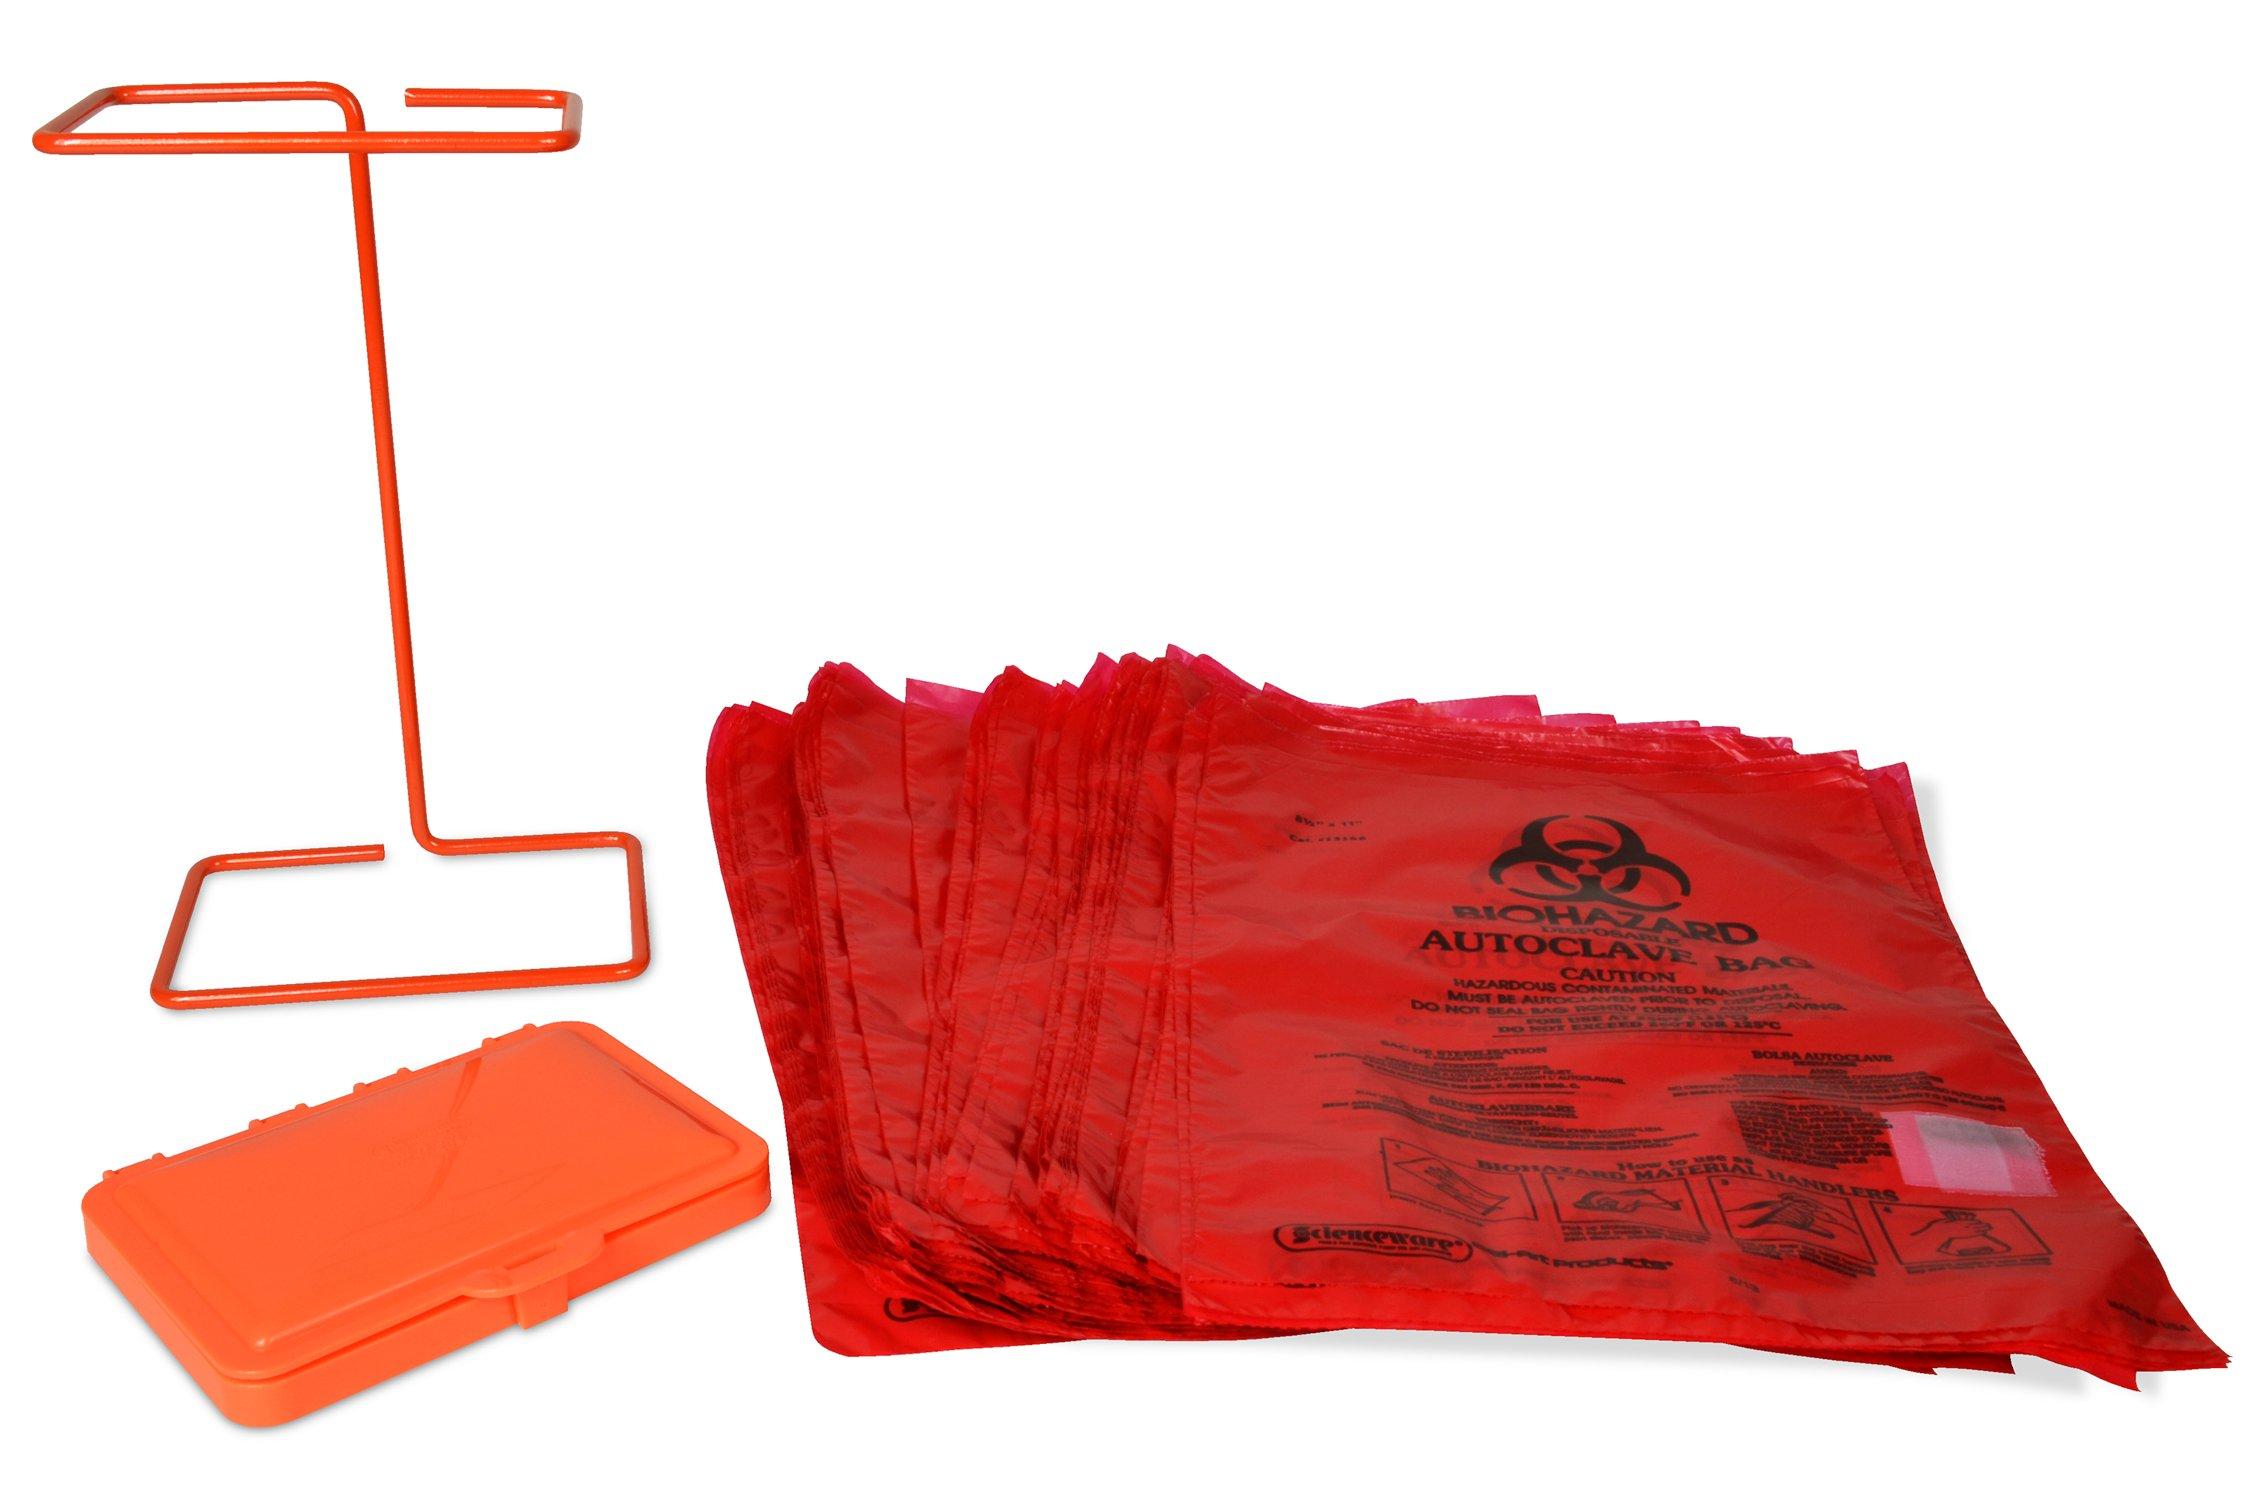 Bel-Art Poxygrid Bench-Top Biohazard Bag Holder Kit; Includes 100 Polyethylene 8¹/₂ x 11 in. Bags (F13193-0500)